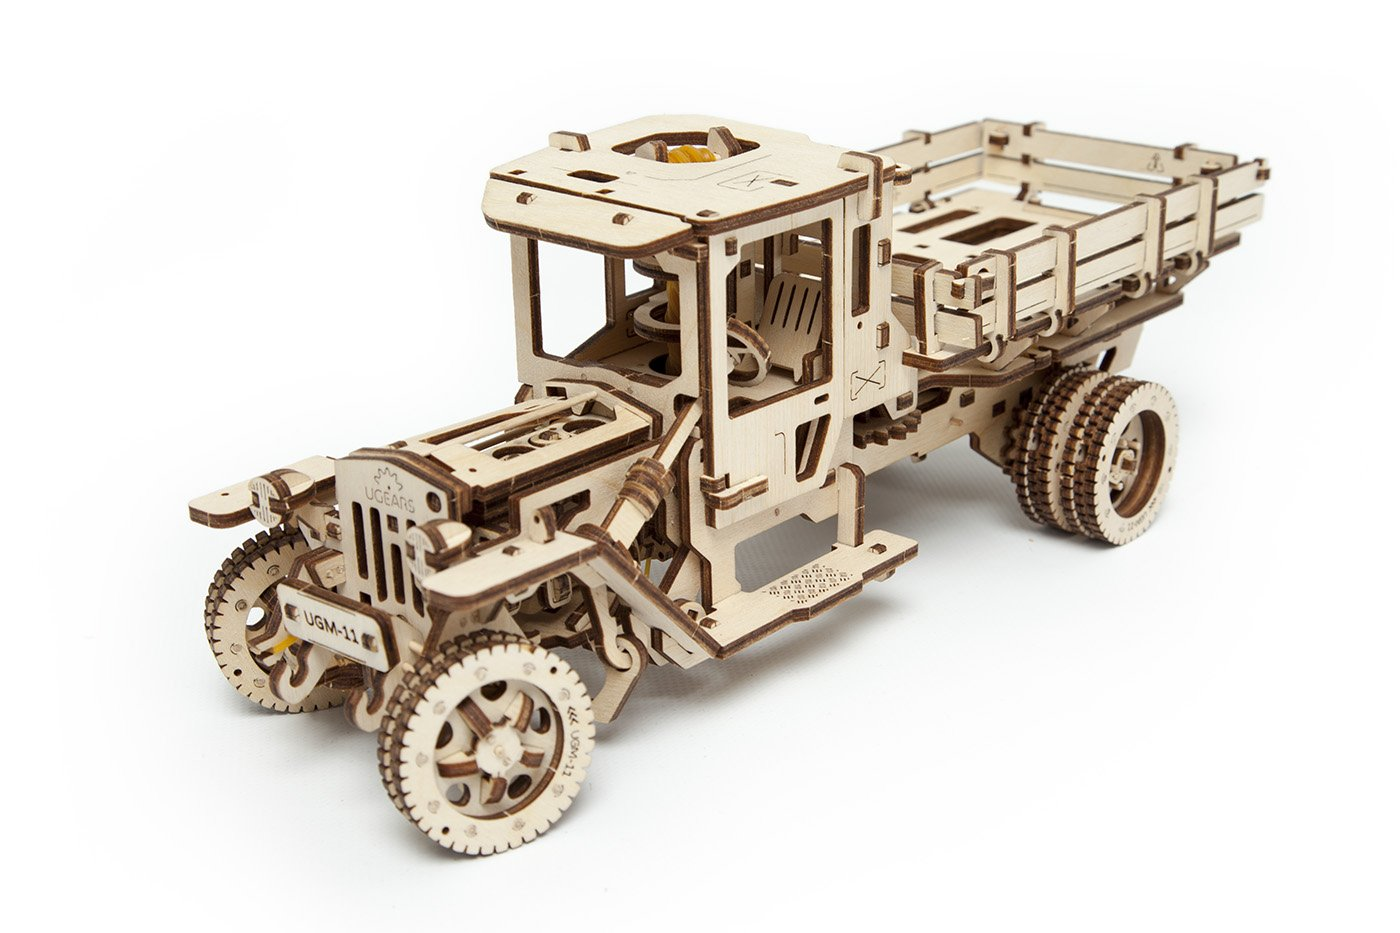 S.T.E.A.M. Line Toys UGears Mechanical Models 3-D Wooden Puzzle - Mechanical 11 Truck 1920's Model T 3